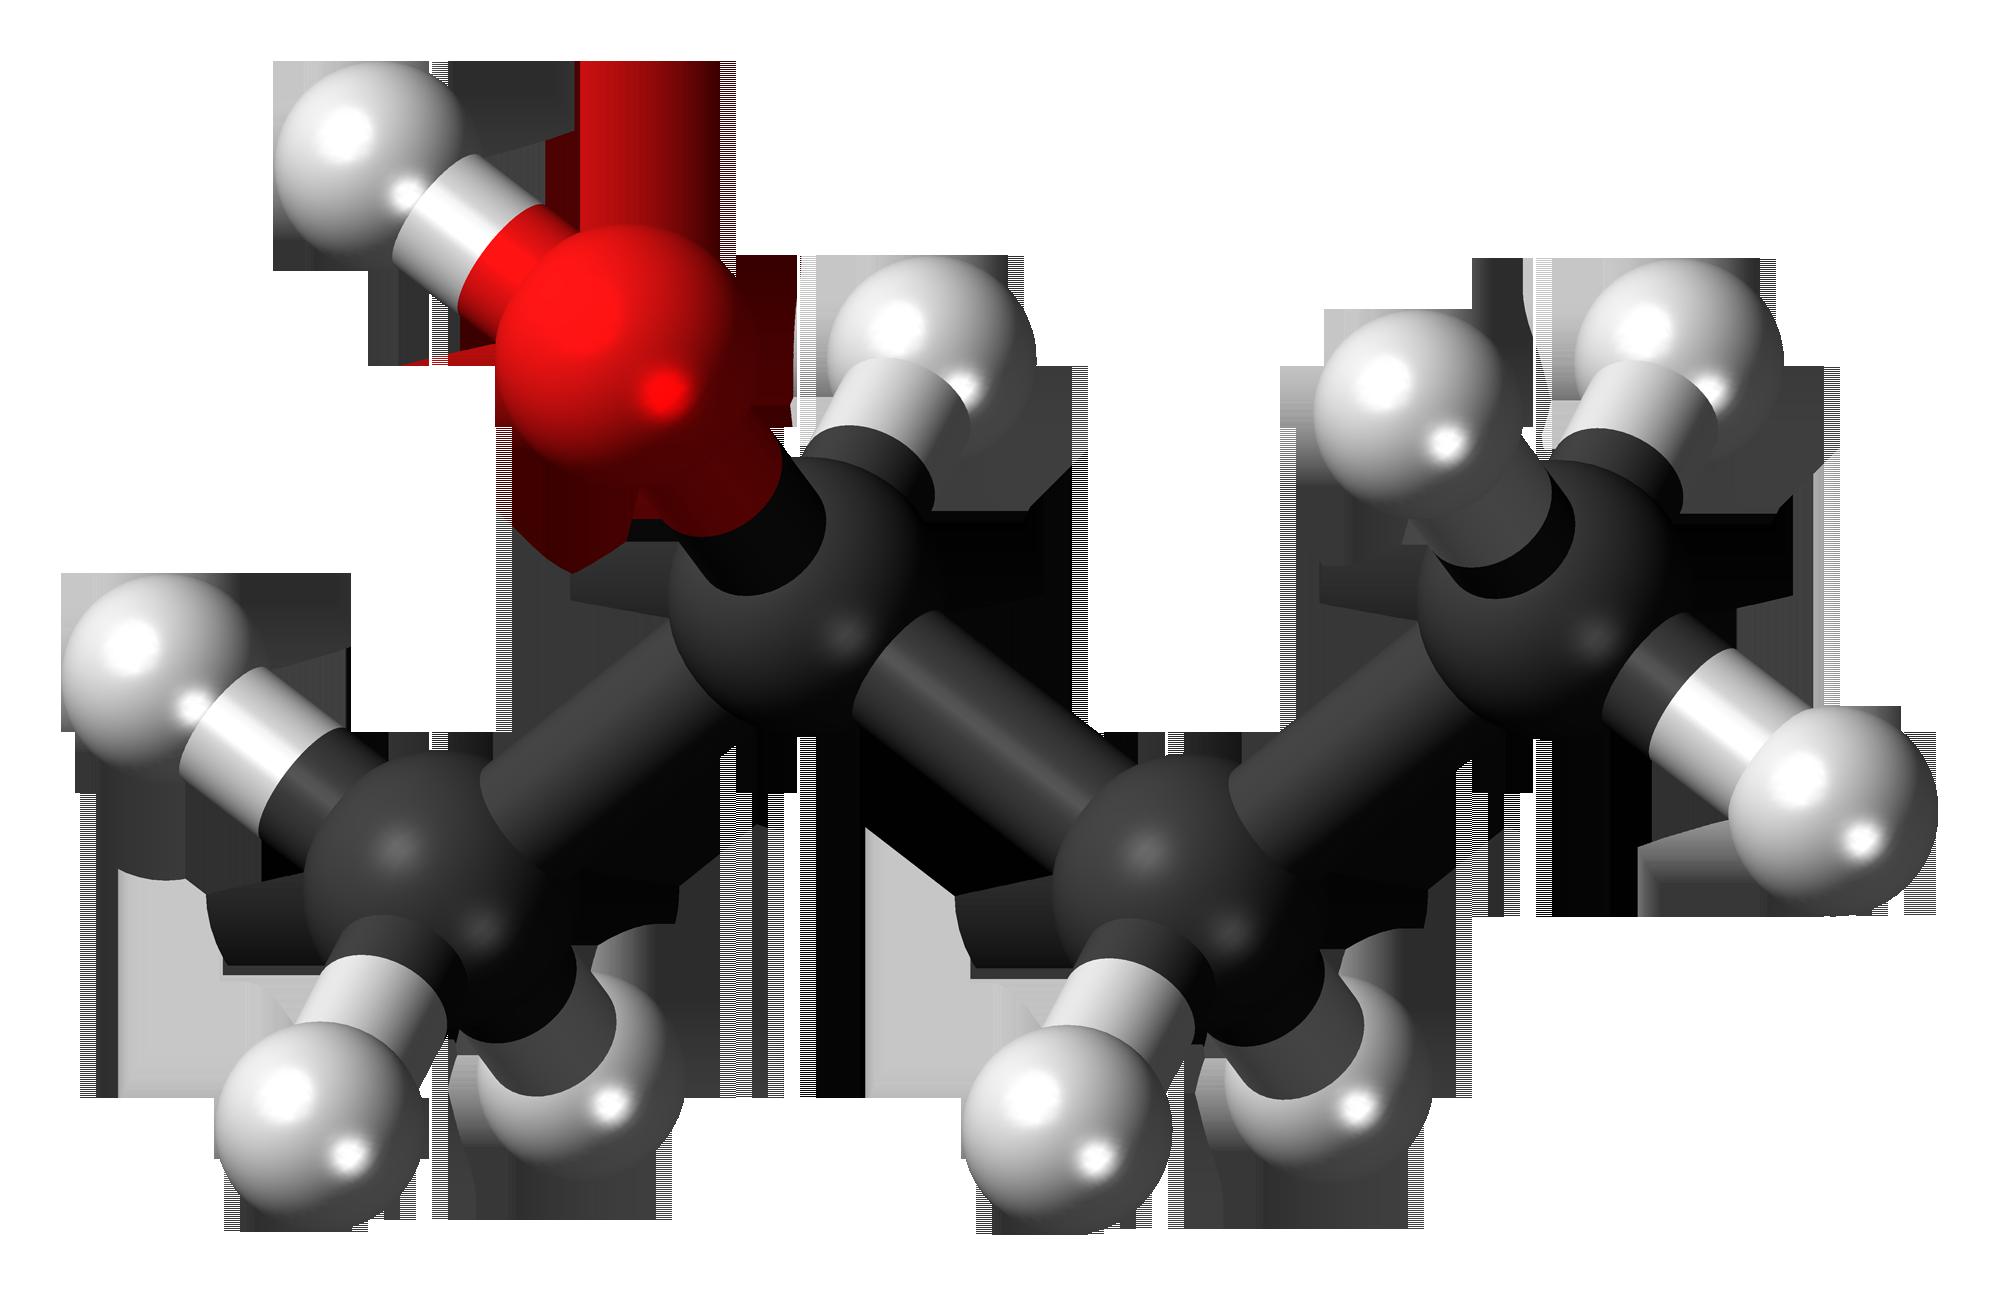 3 isomers of butanol 10091 2-mercapto-3-butanol : delong chemicals america:  3-mercapto-2-butanol, mixture of isomers odor: sulfur, meat scallionbroth beijing lys chemicals.